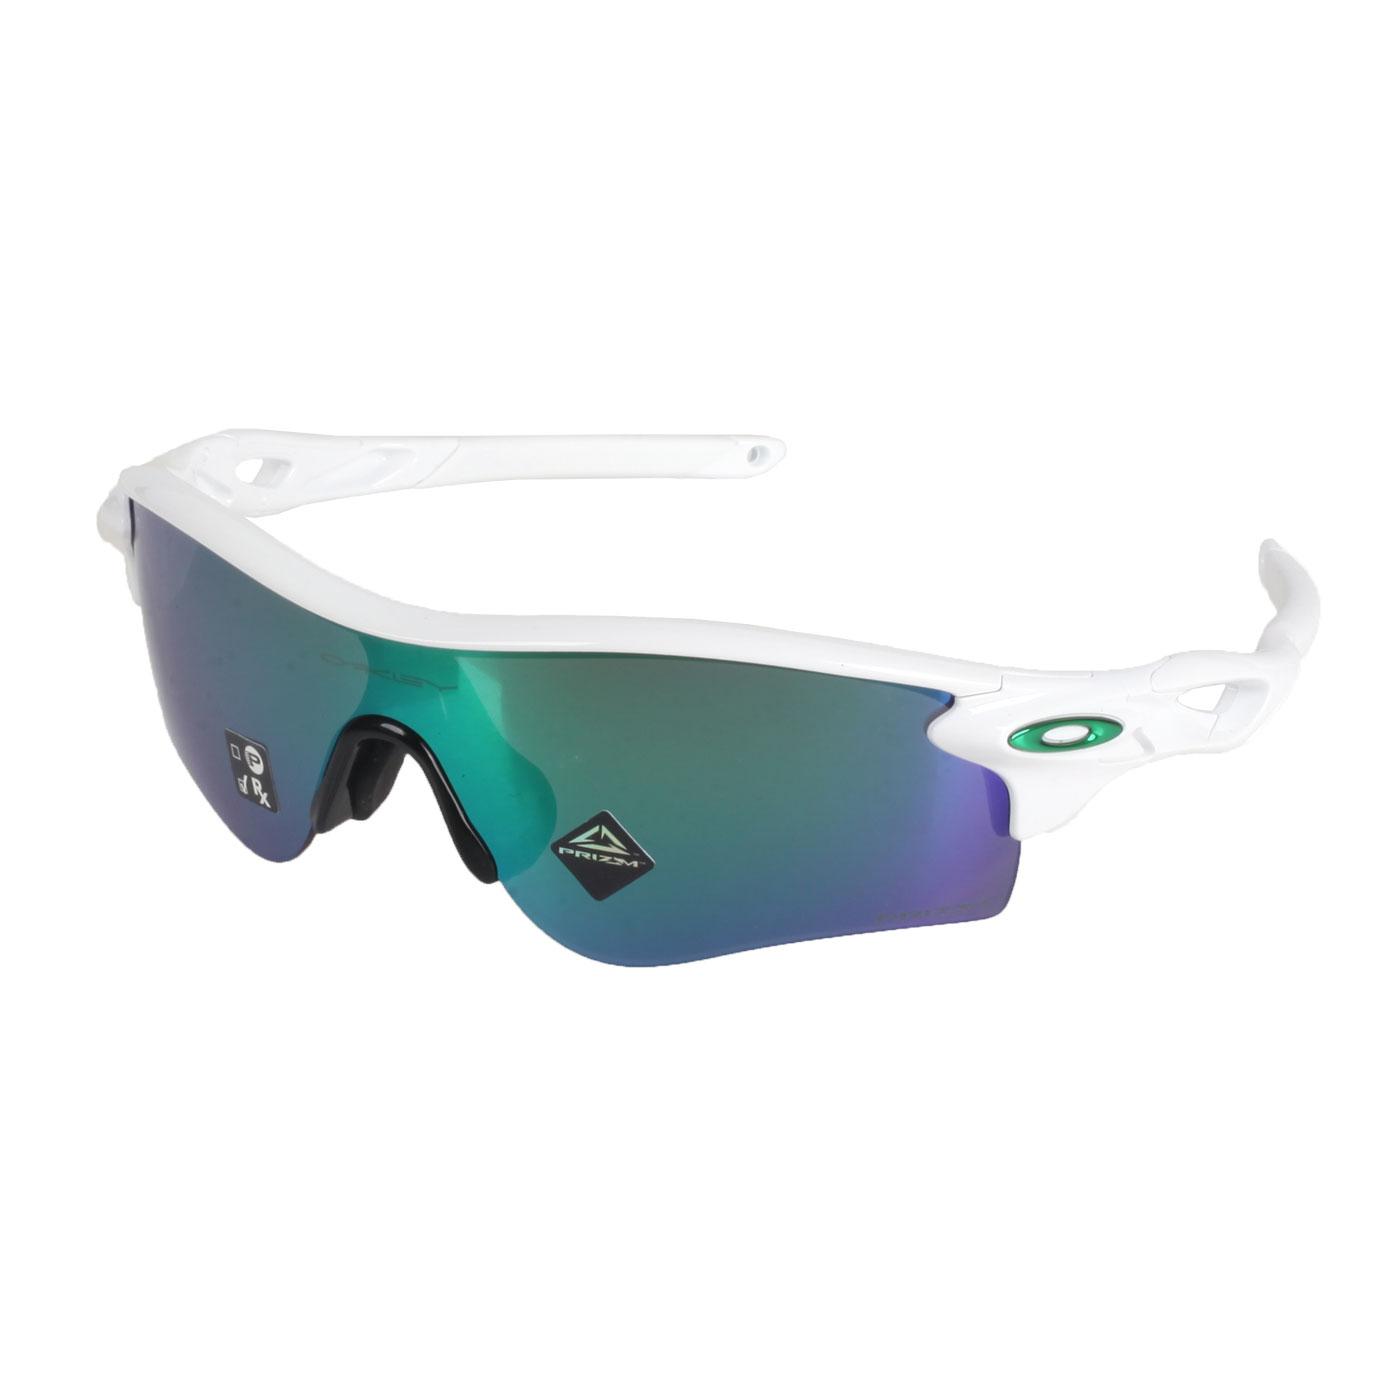 OAKLEY RADARLOCK PATH 一般太陽眼鏡(附硬盒鼻墊) OAK-OO9206-4338 - 白綠